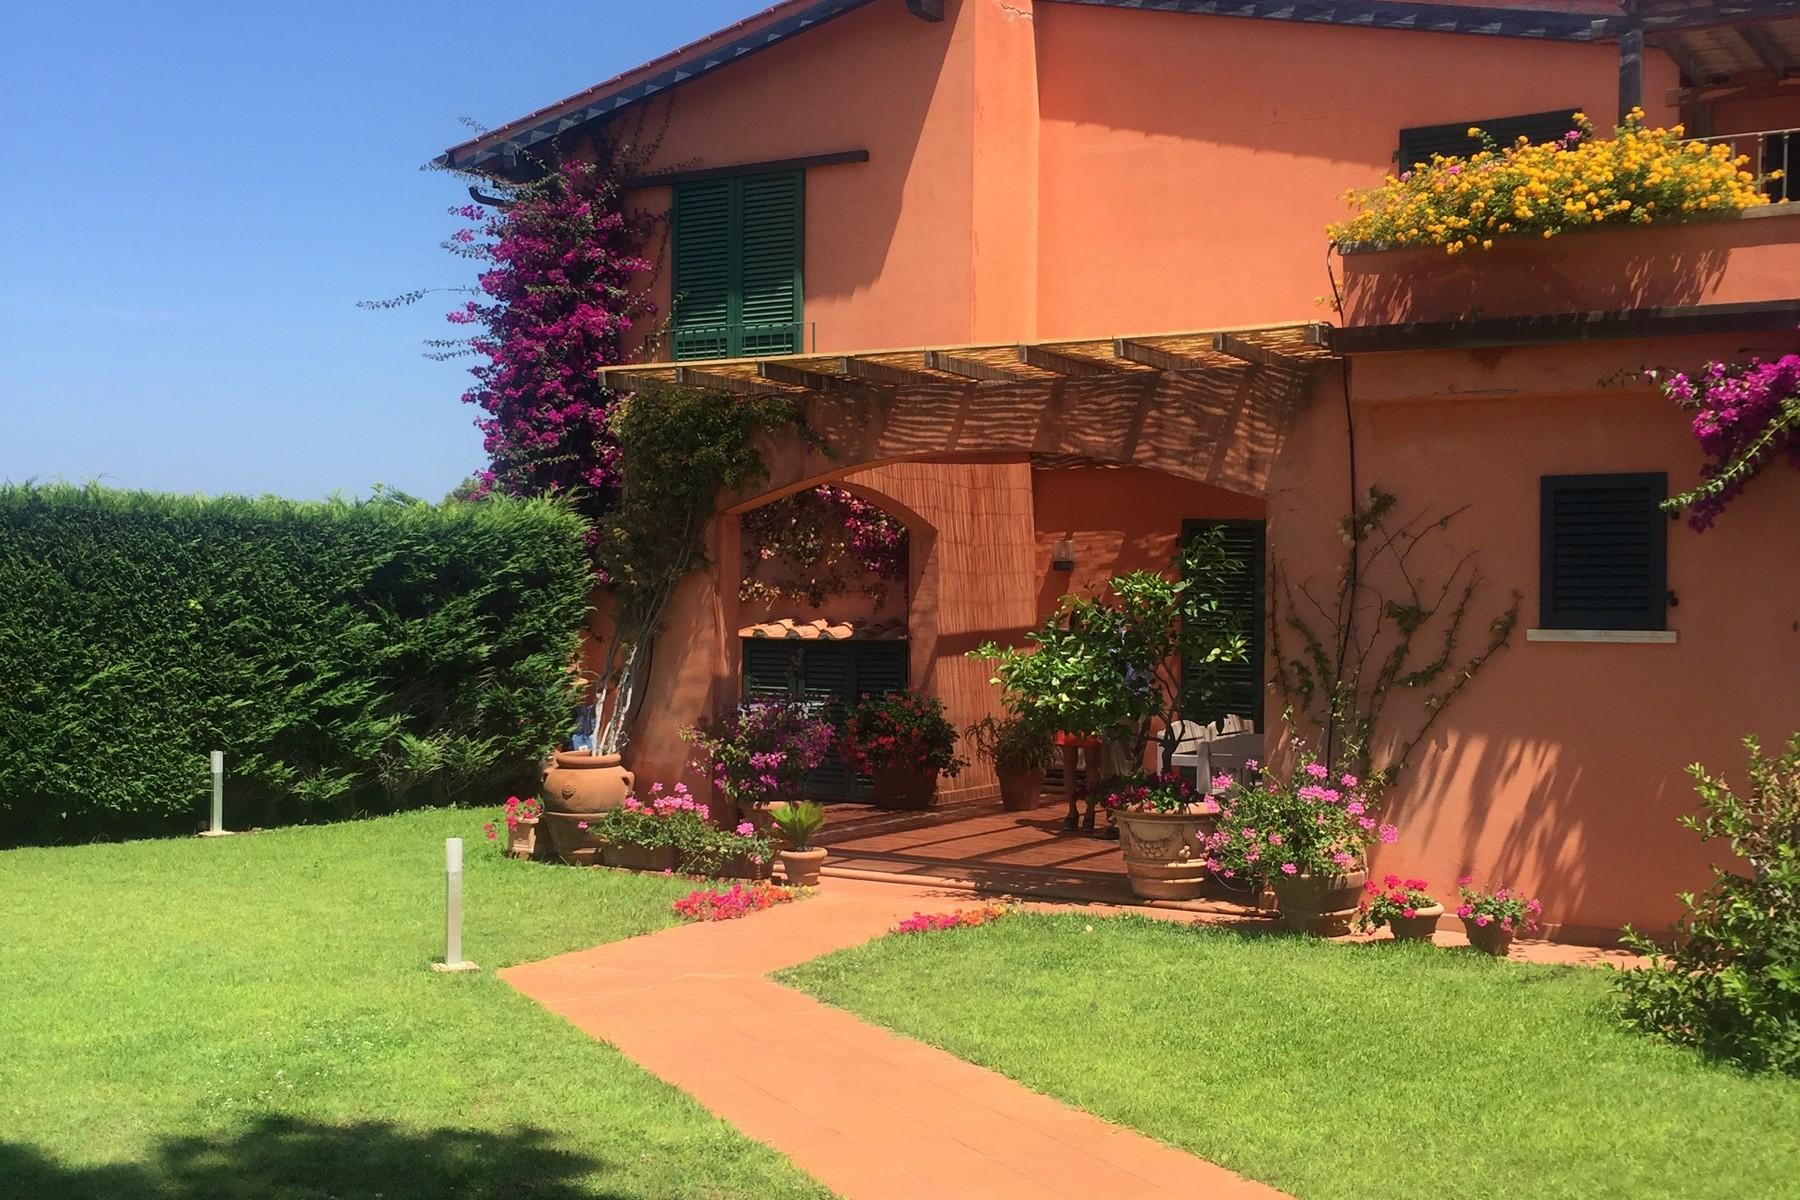 Casa indipendente in Vendita a Capoliveri: 5 locali, 190 mq - Foto 8